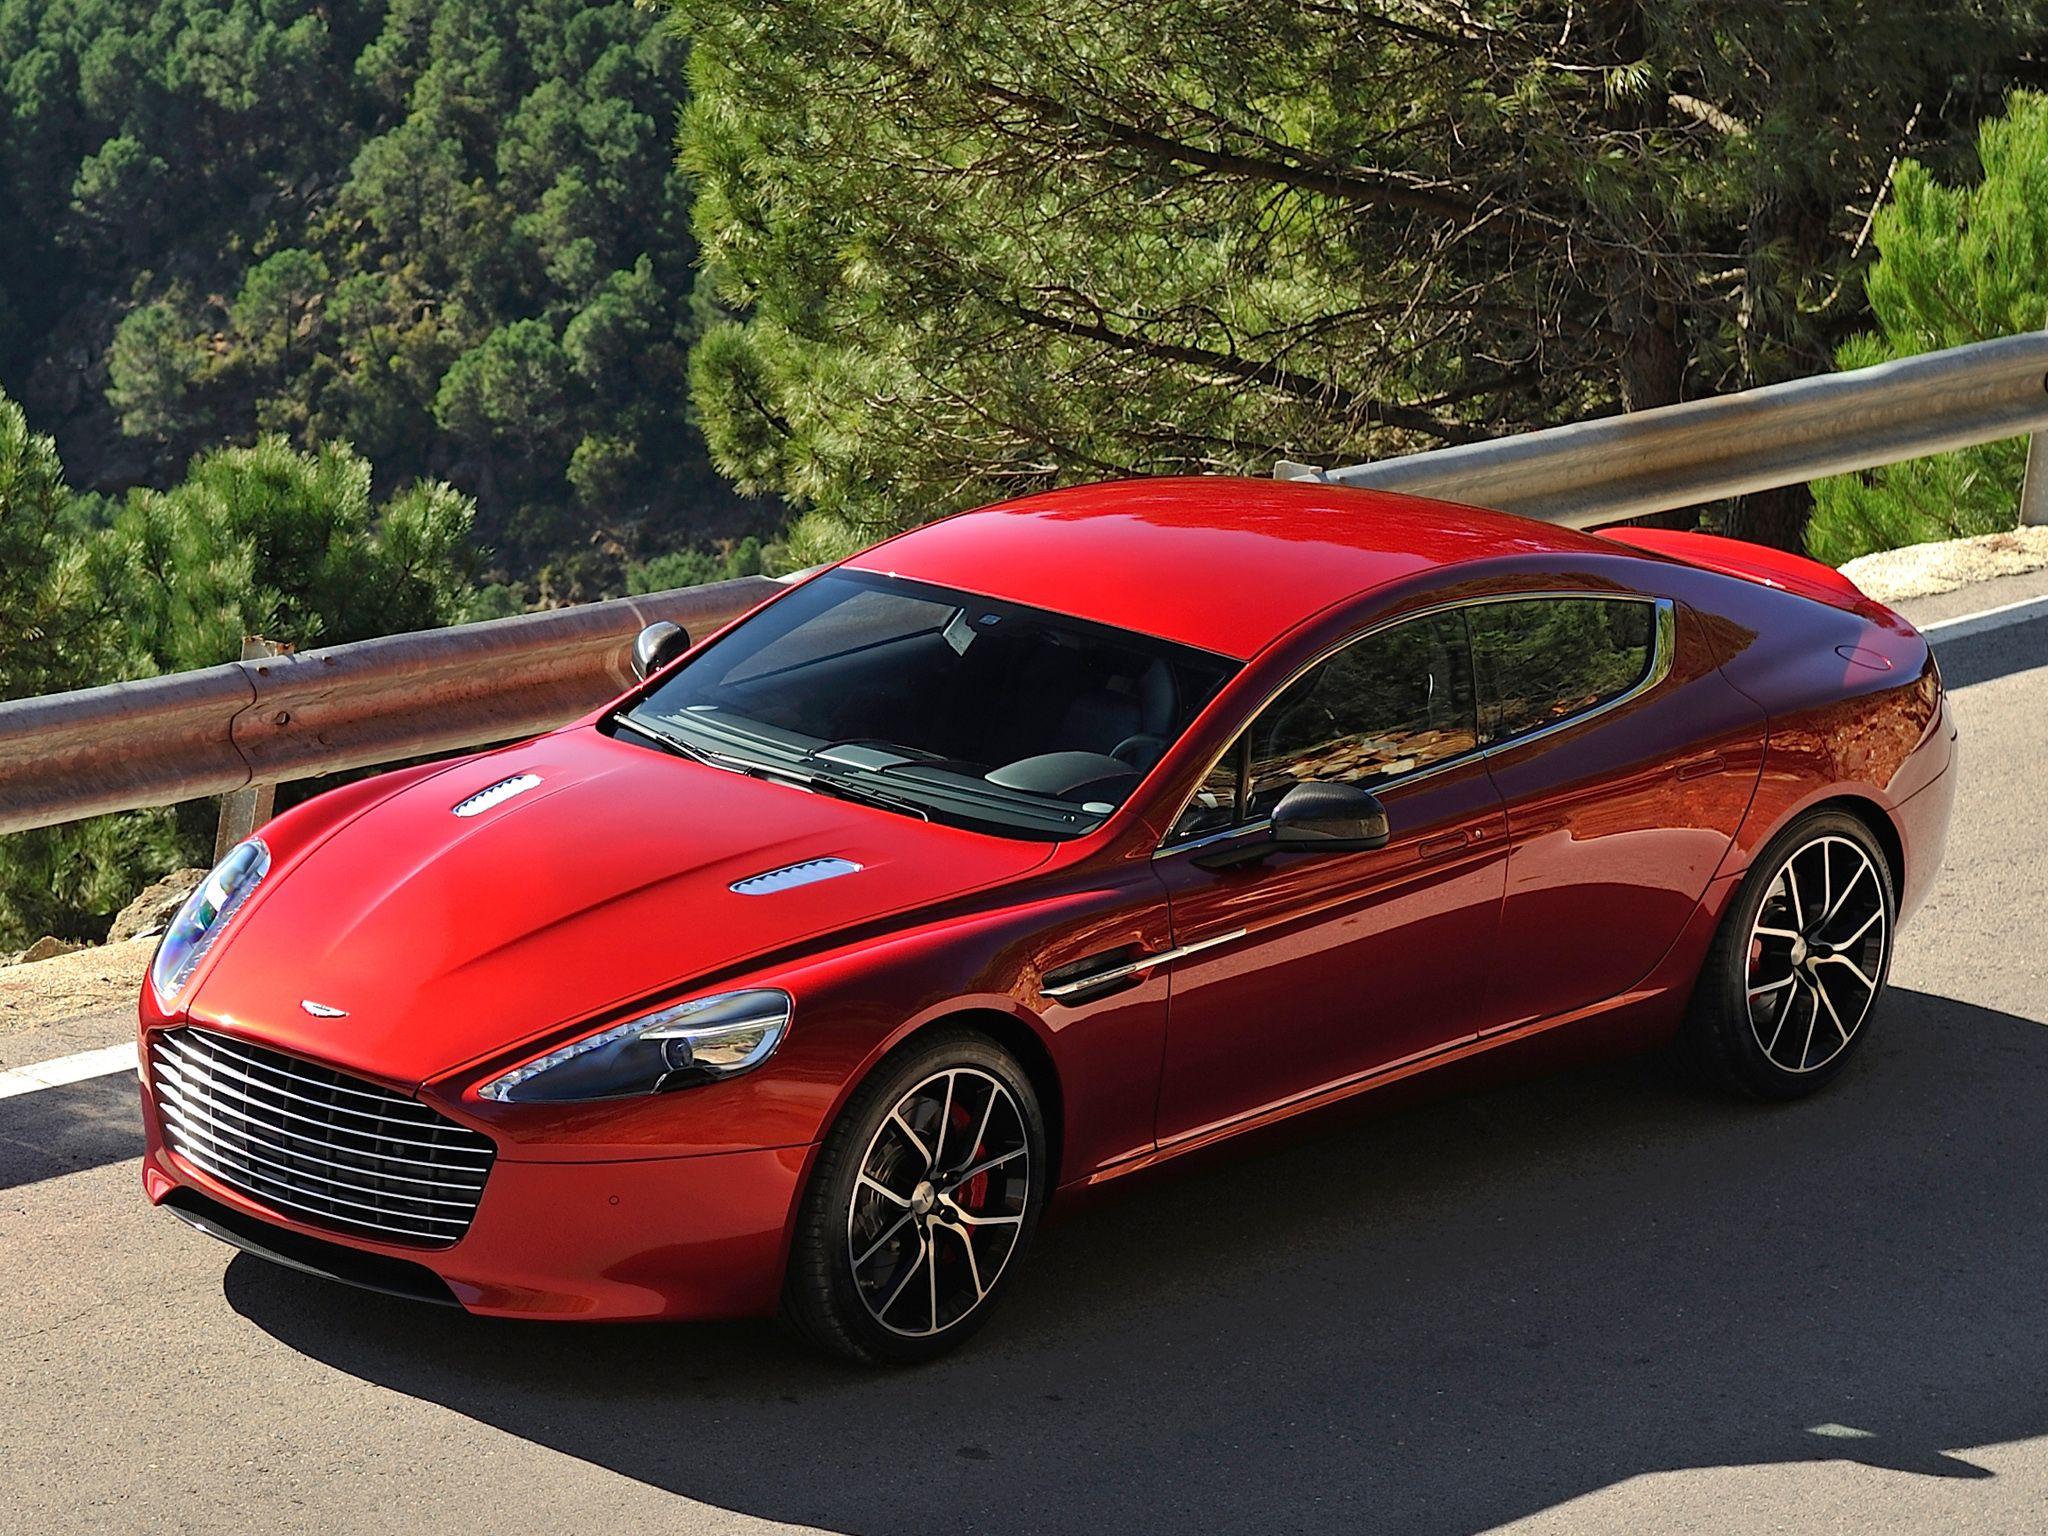 Обои rapide s, Red, White, машины, две. Автомобили foto 7